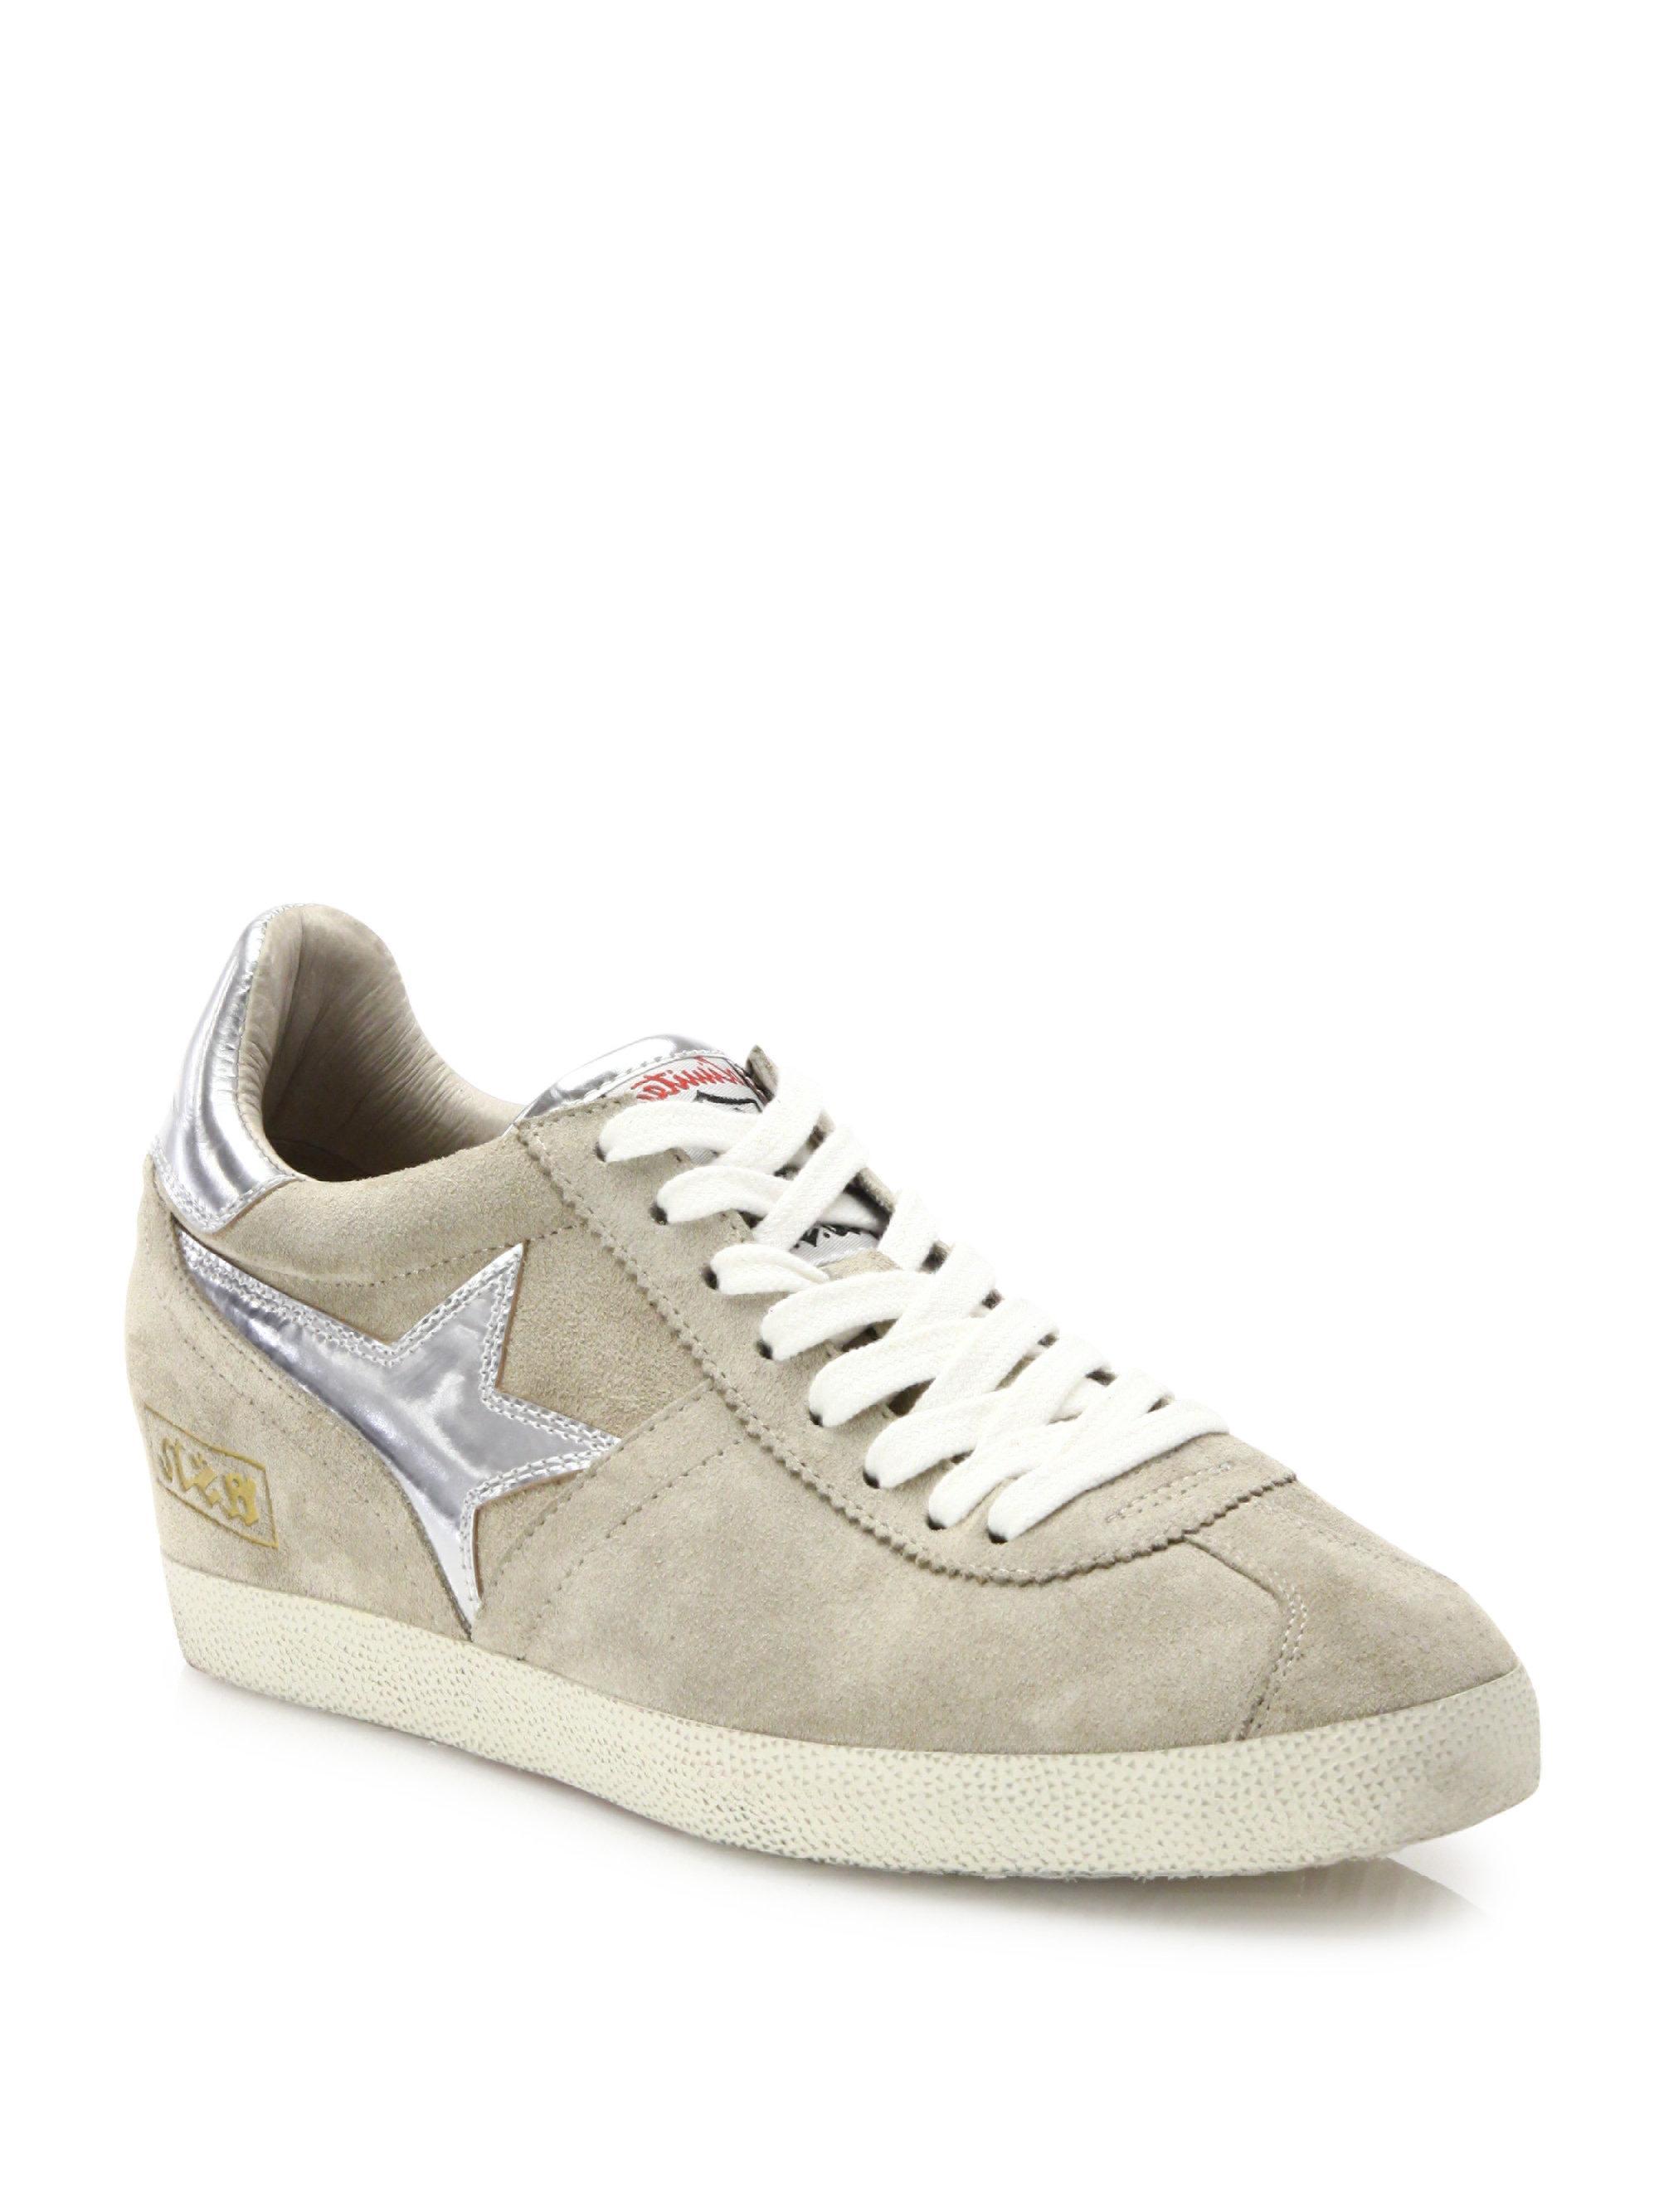 Ash Shoes At Saks Sale